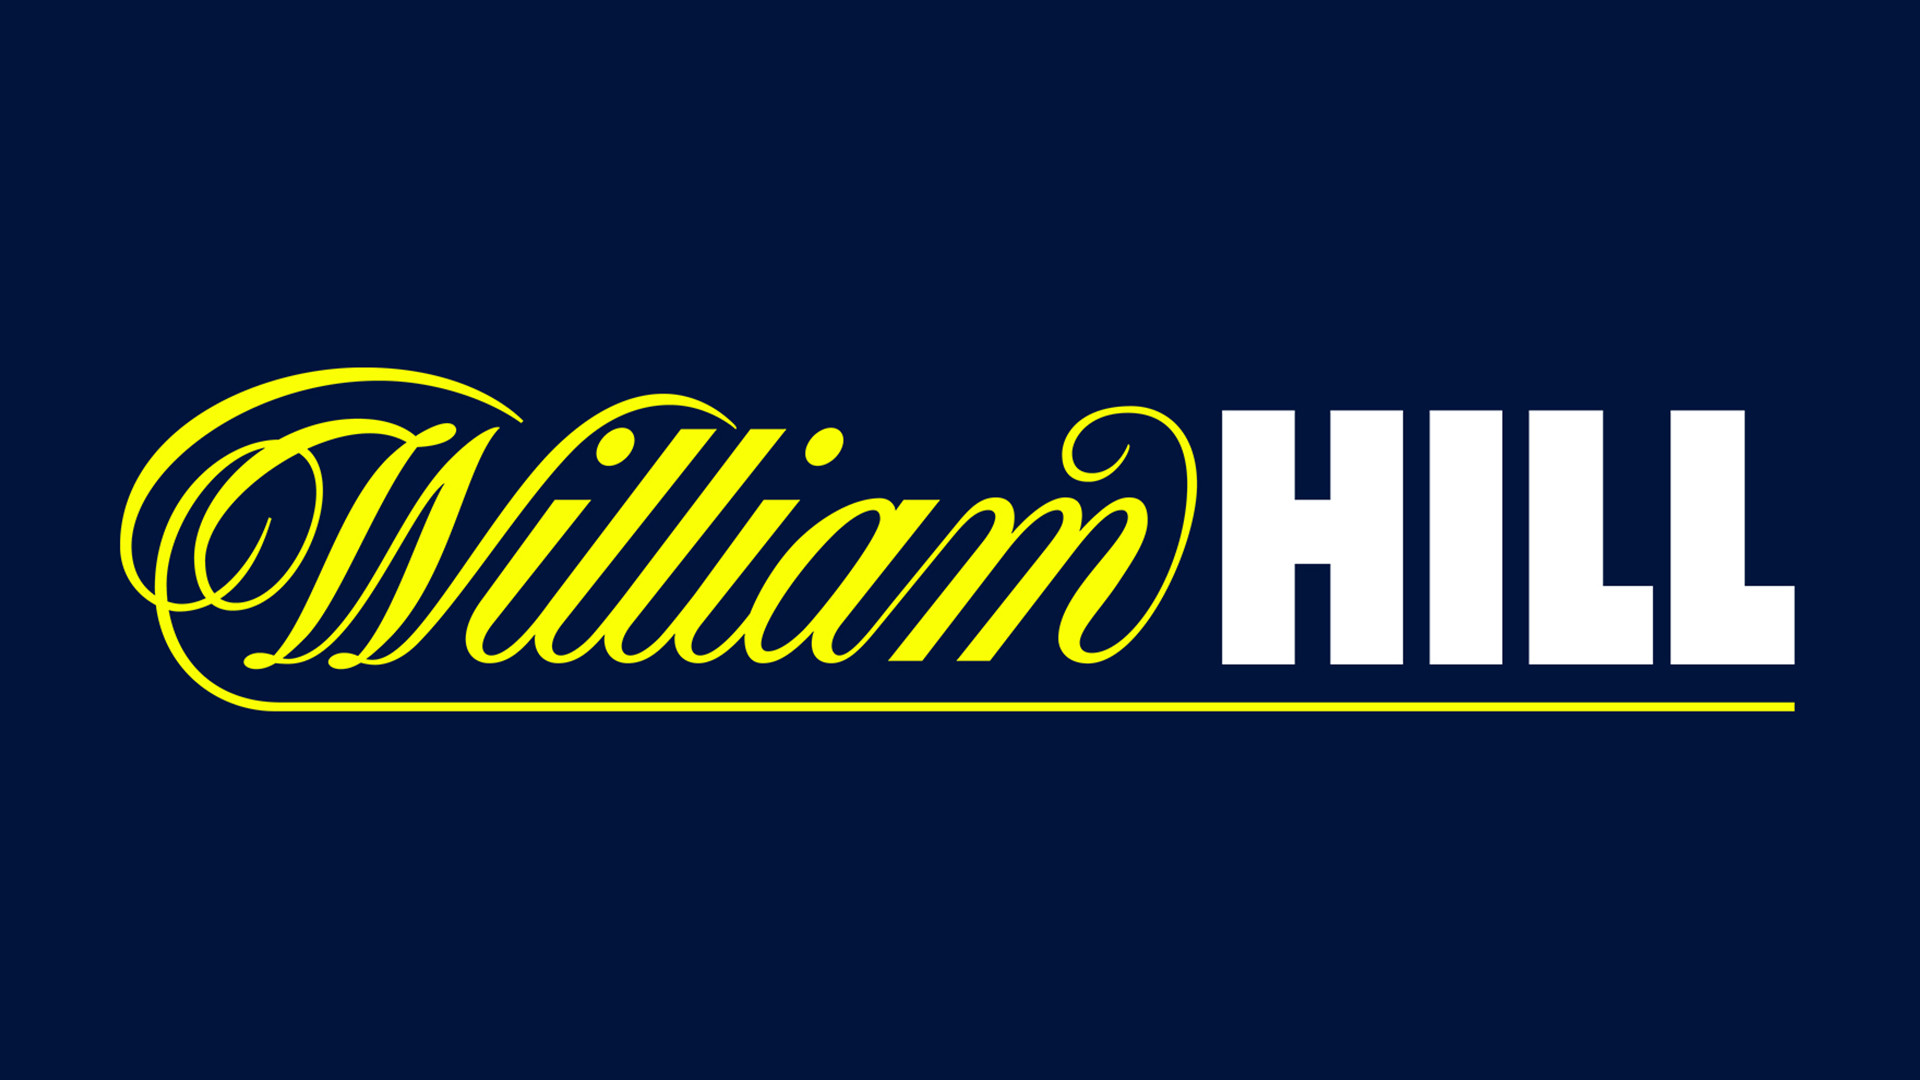 Recensione del casinò di William Hill: casinò affidabile o truffa?